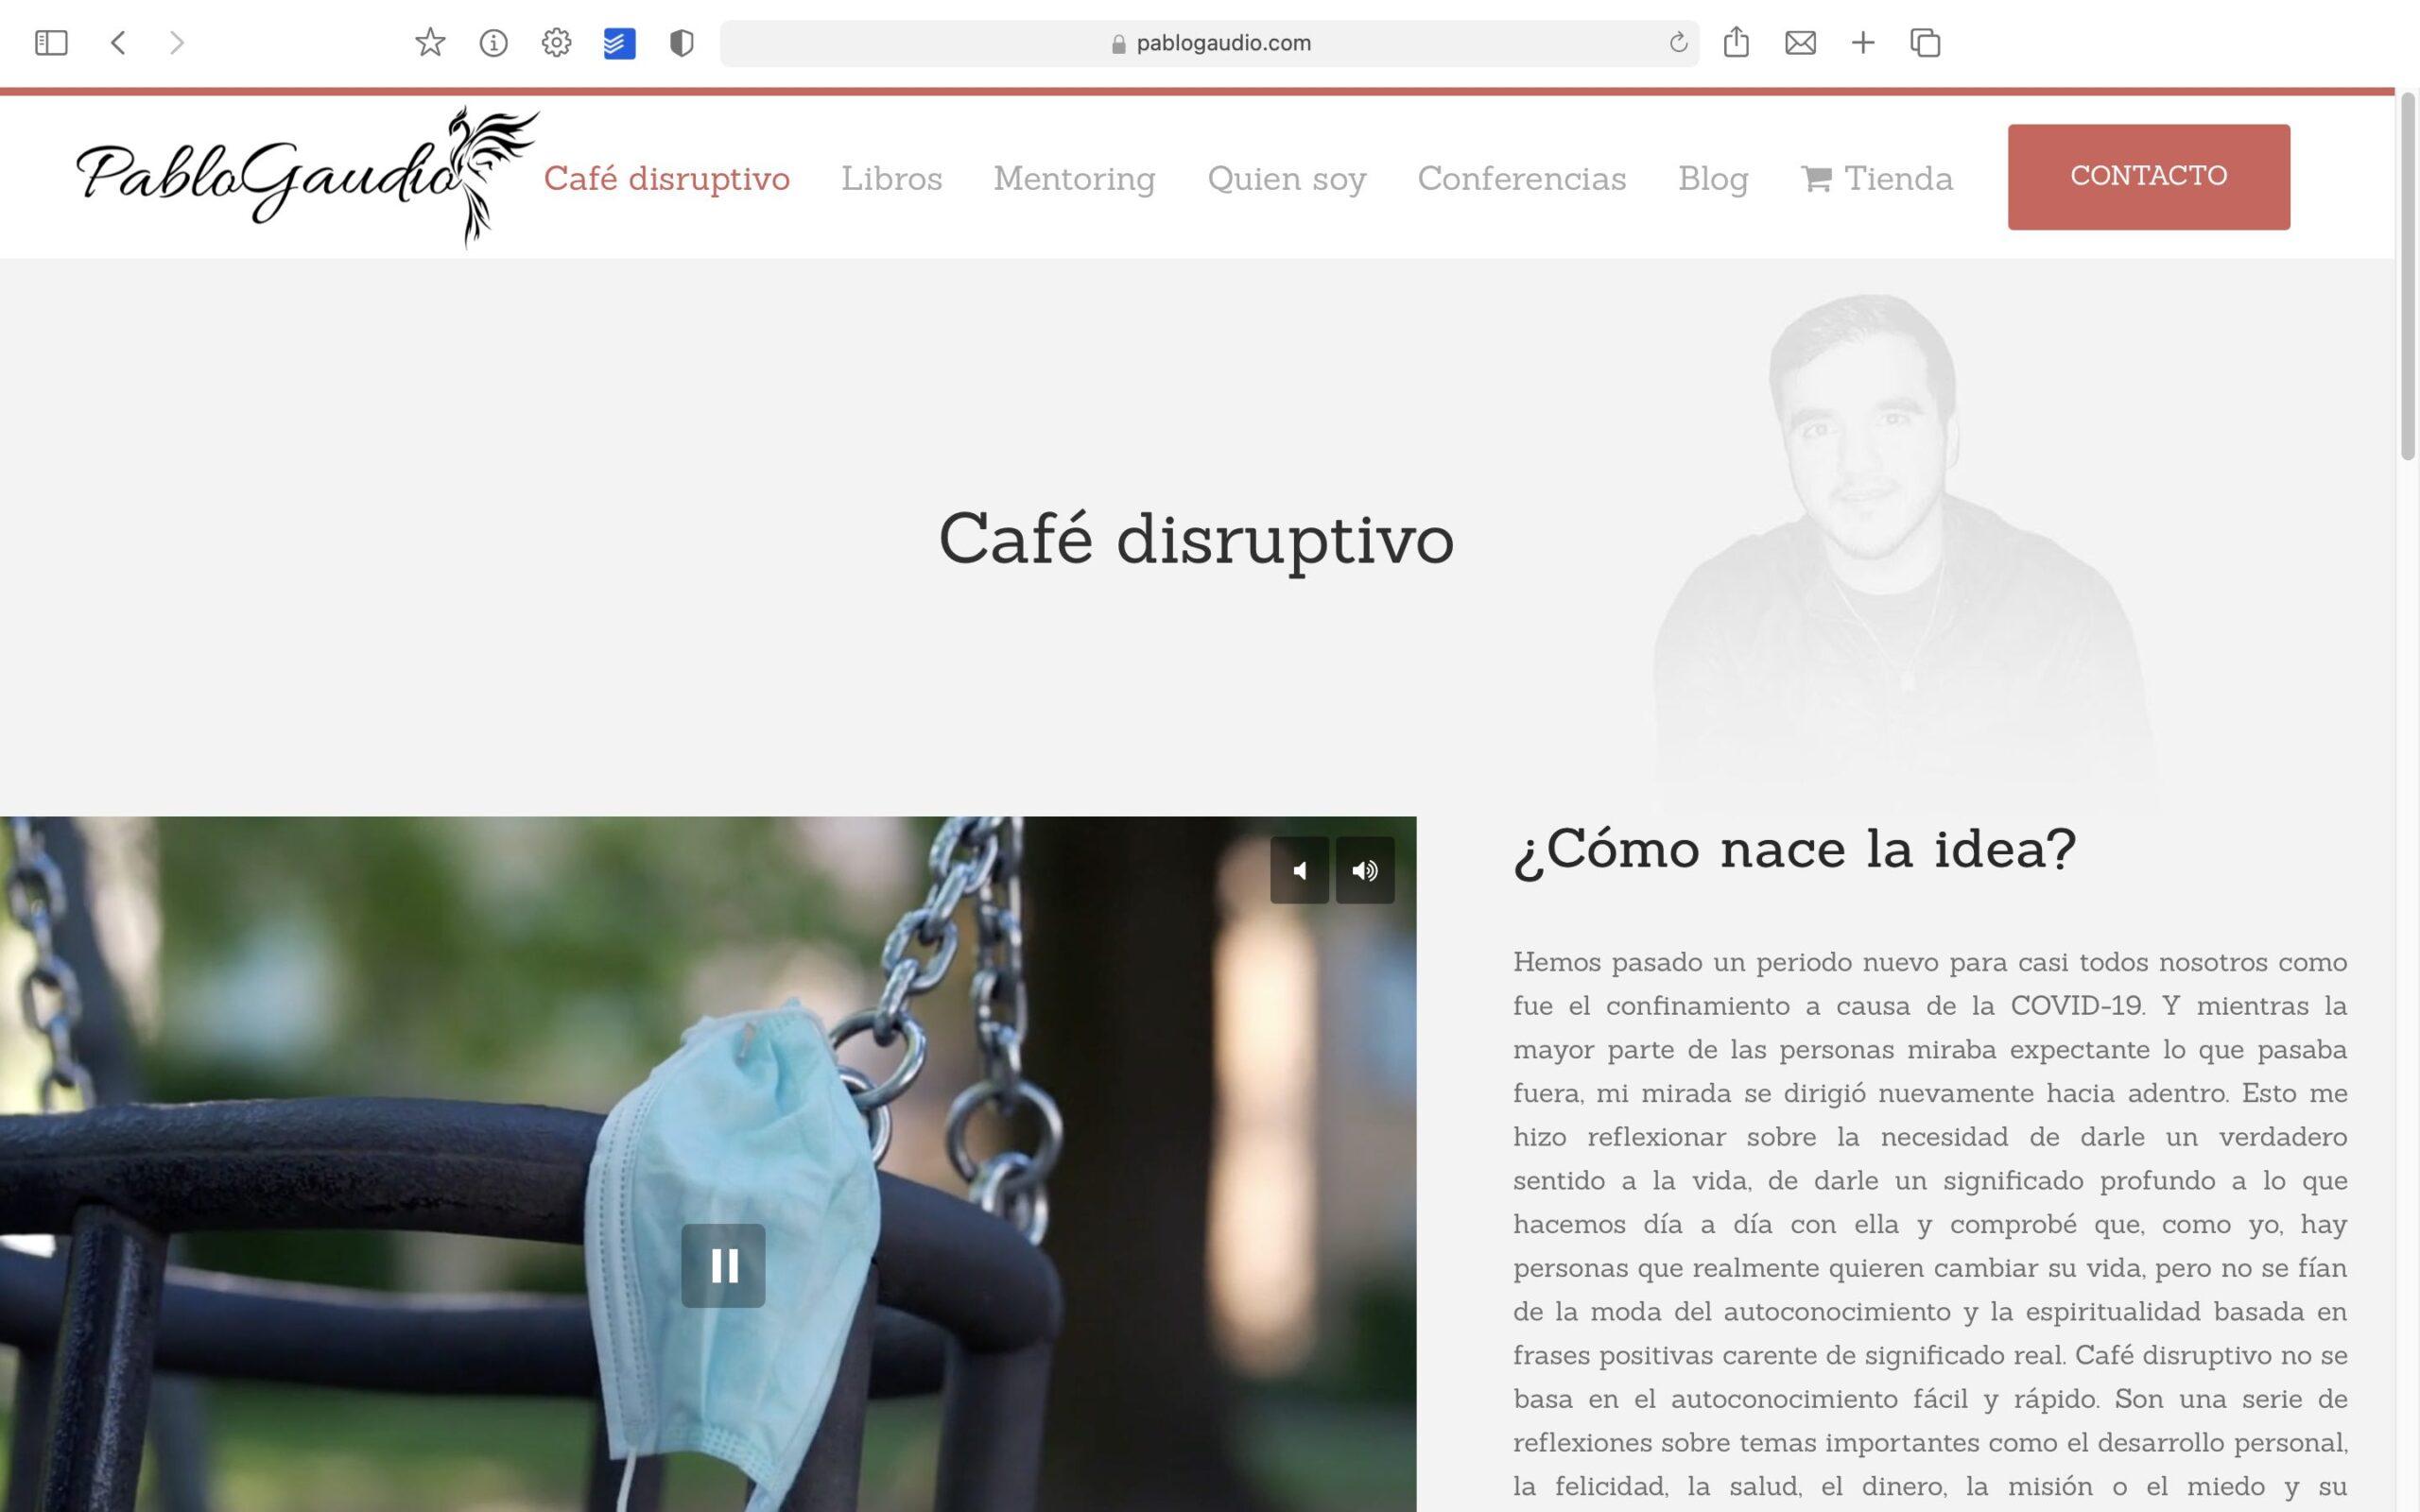 Pablo Gaudio Café Bolcreativo